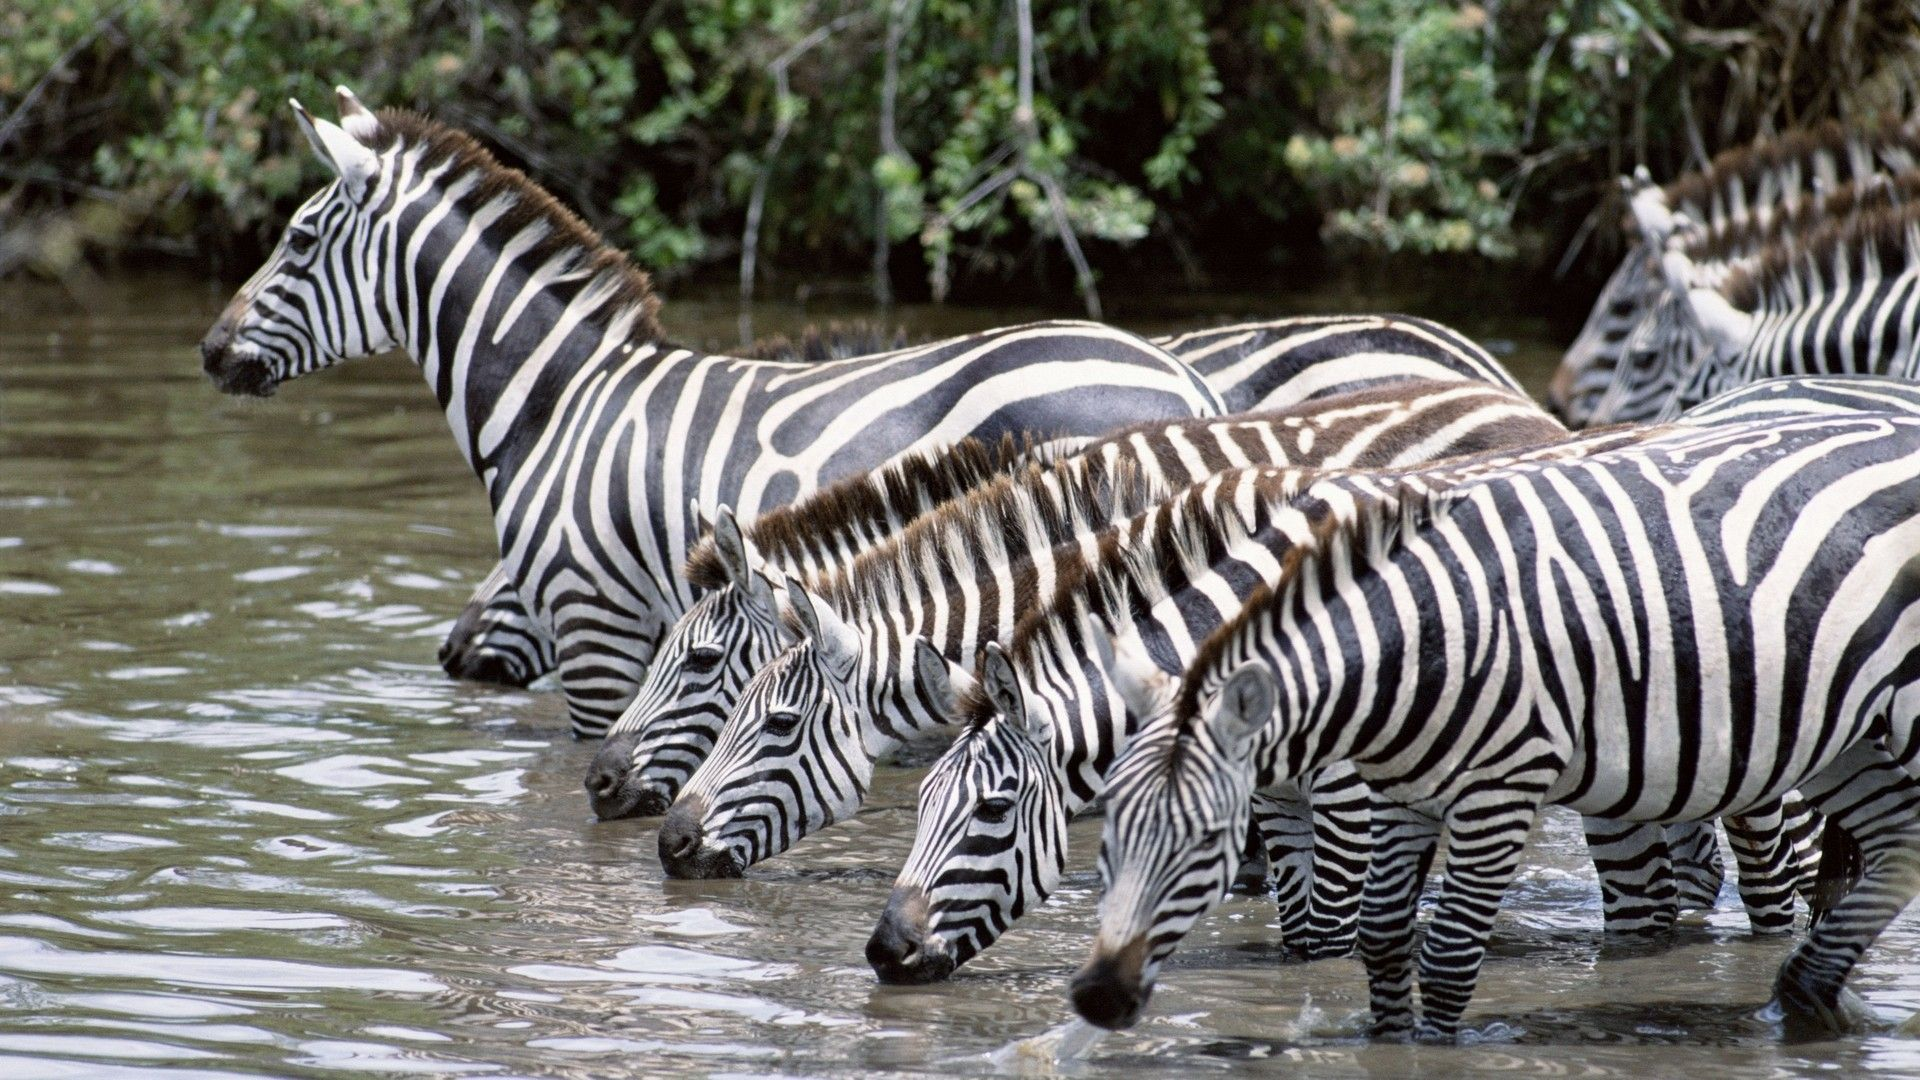 Zebra Drinking Water